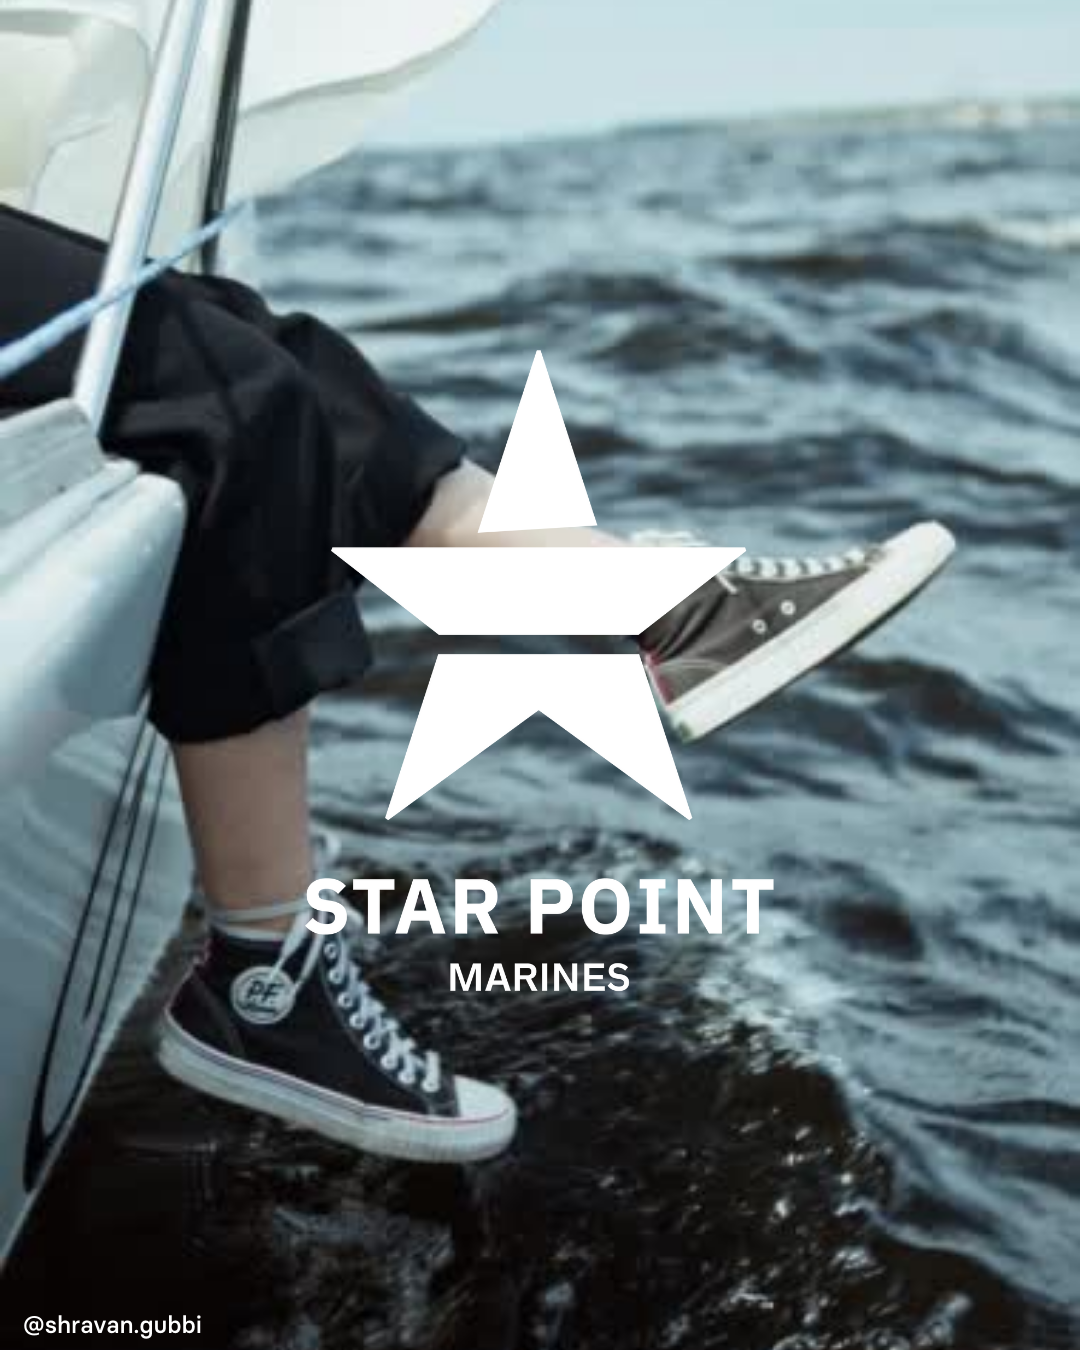 Shravan_gubbi_Starpoint_logo_4